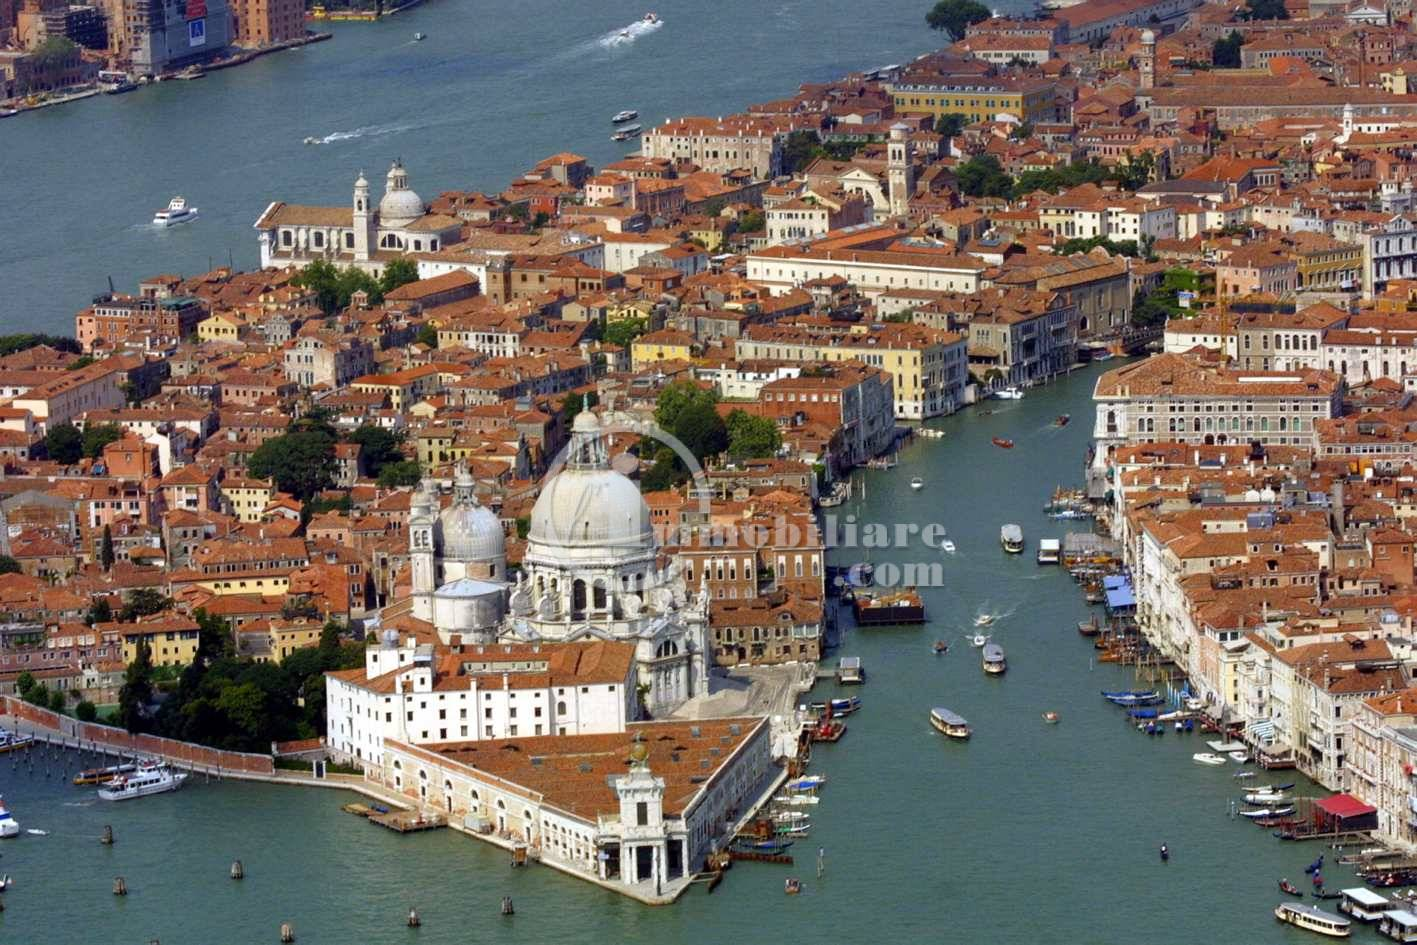 Attivita'-licenza in Vendita a Venezia: 4750 mq